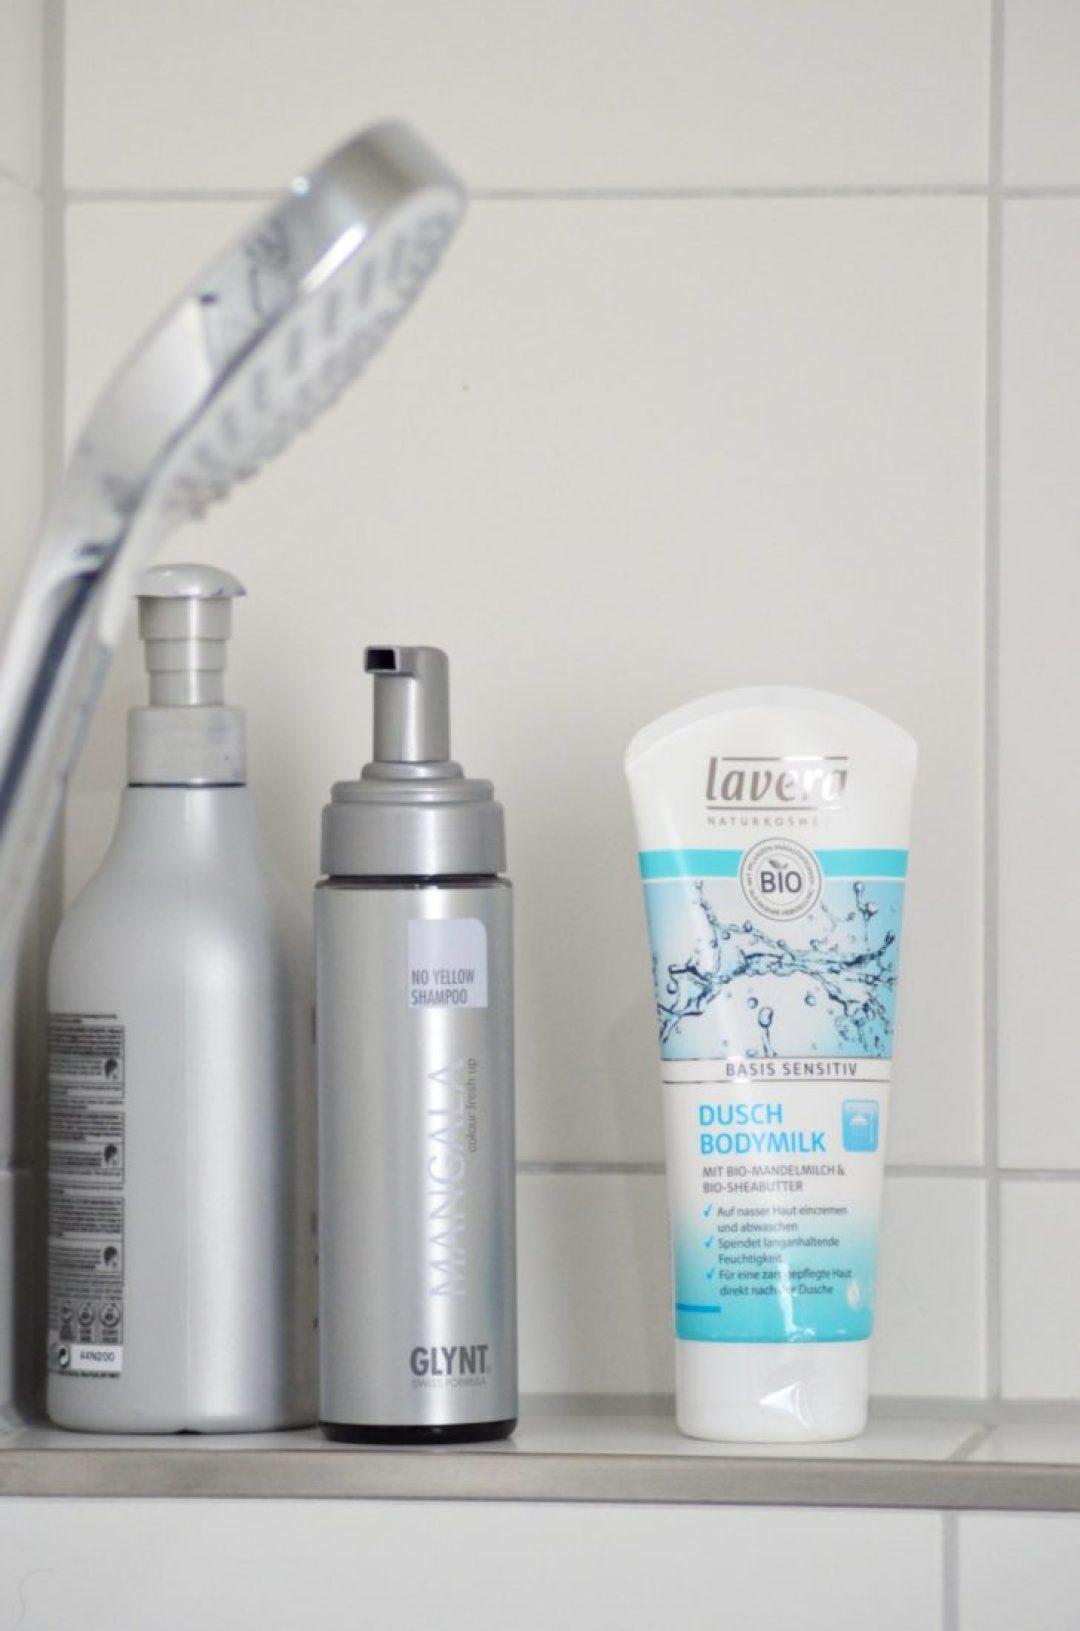 Frau Piepenkötter I Tägliche Hautpflege mit guten Produkten Apotal